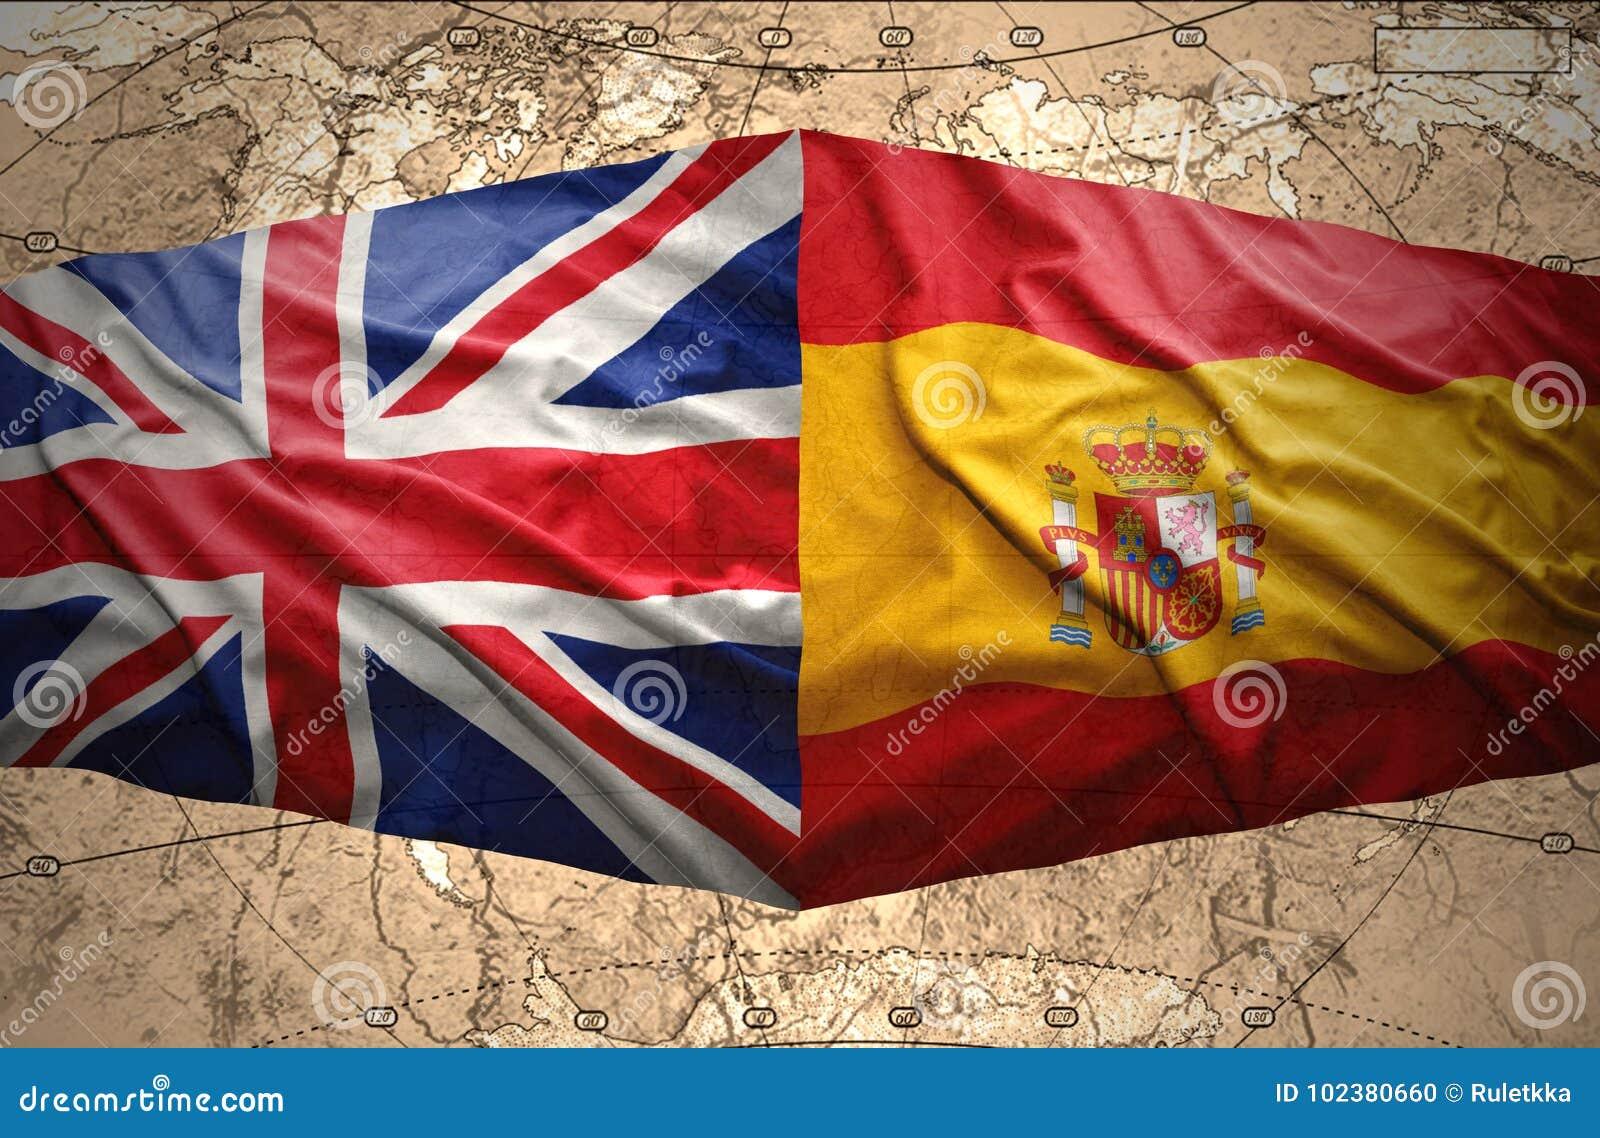 Map Of Spain And United Kingdom.United Kingdom And Spain Stock Illustration Illustration Of Partner